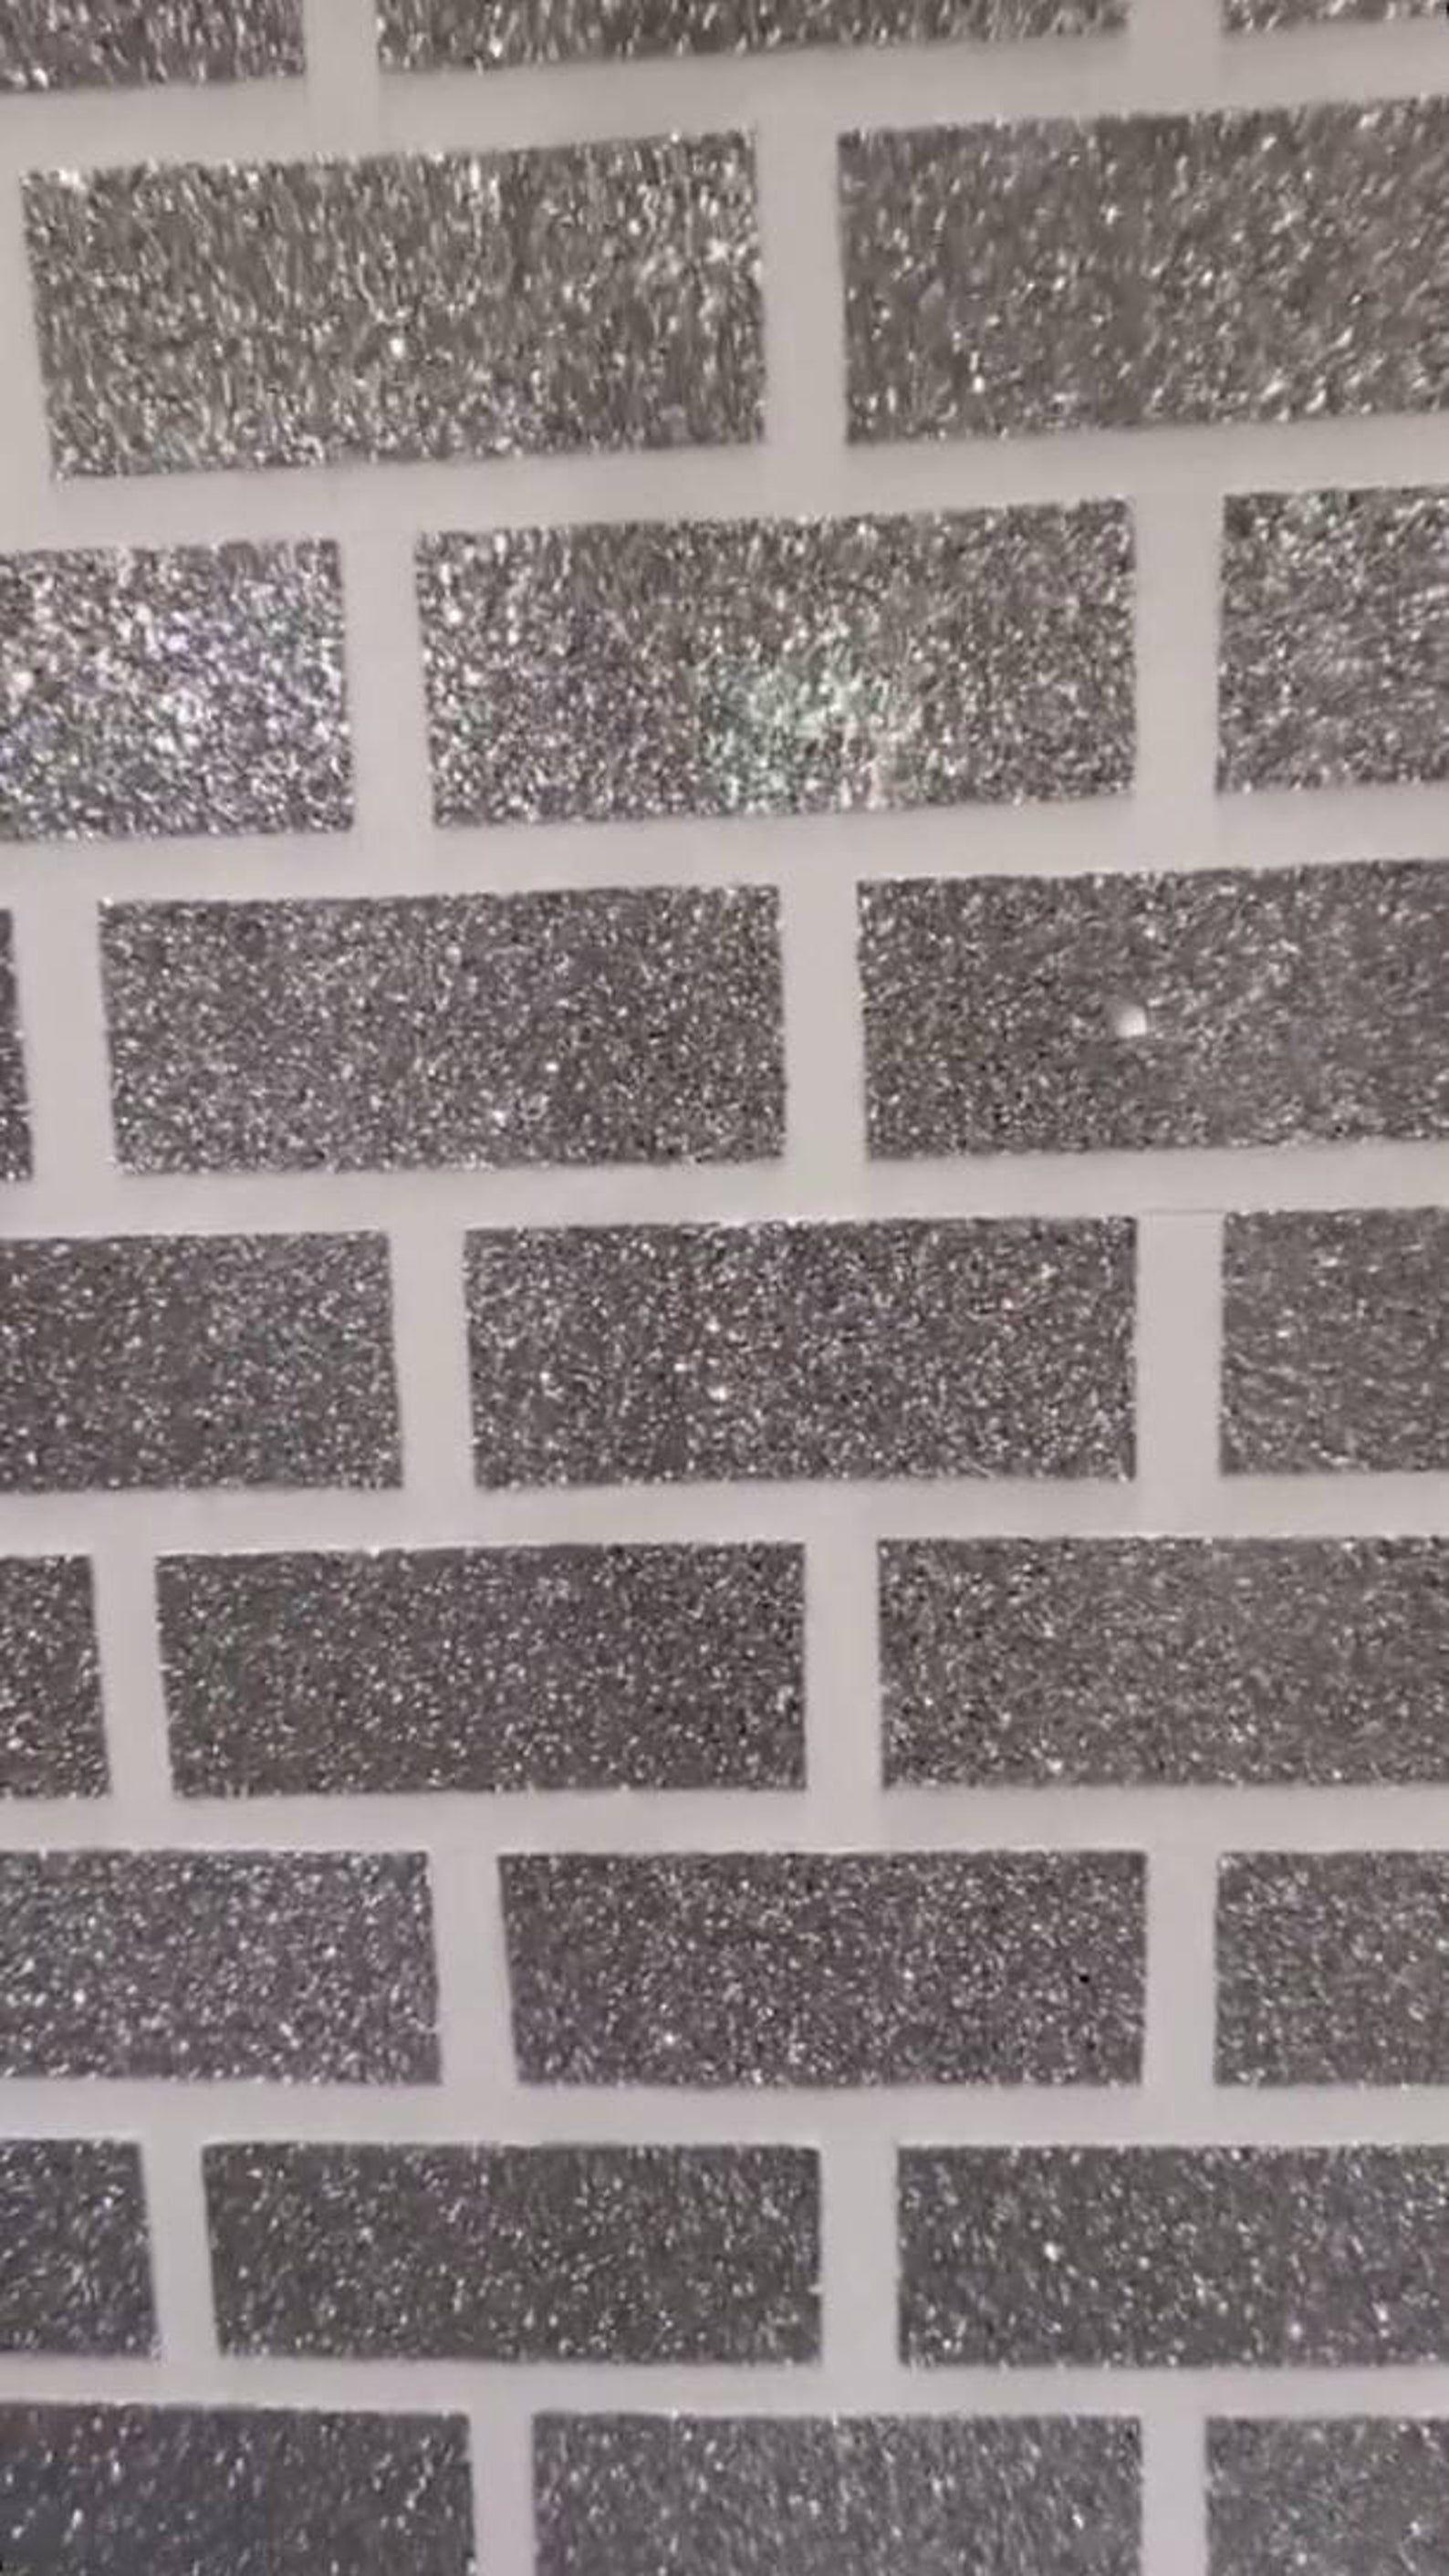 Glitter Brick Self Adhesive Wall Tiles Glitter Wall Murals Glitter Stickers For Walls Self Adhesive Wall Tiles Glitter Paint For Walls Glitter Wall